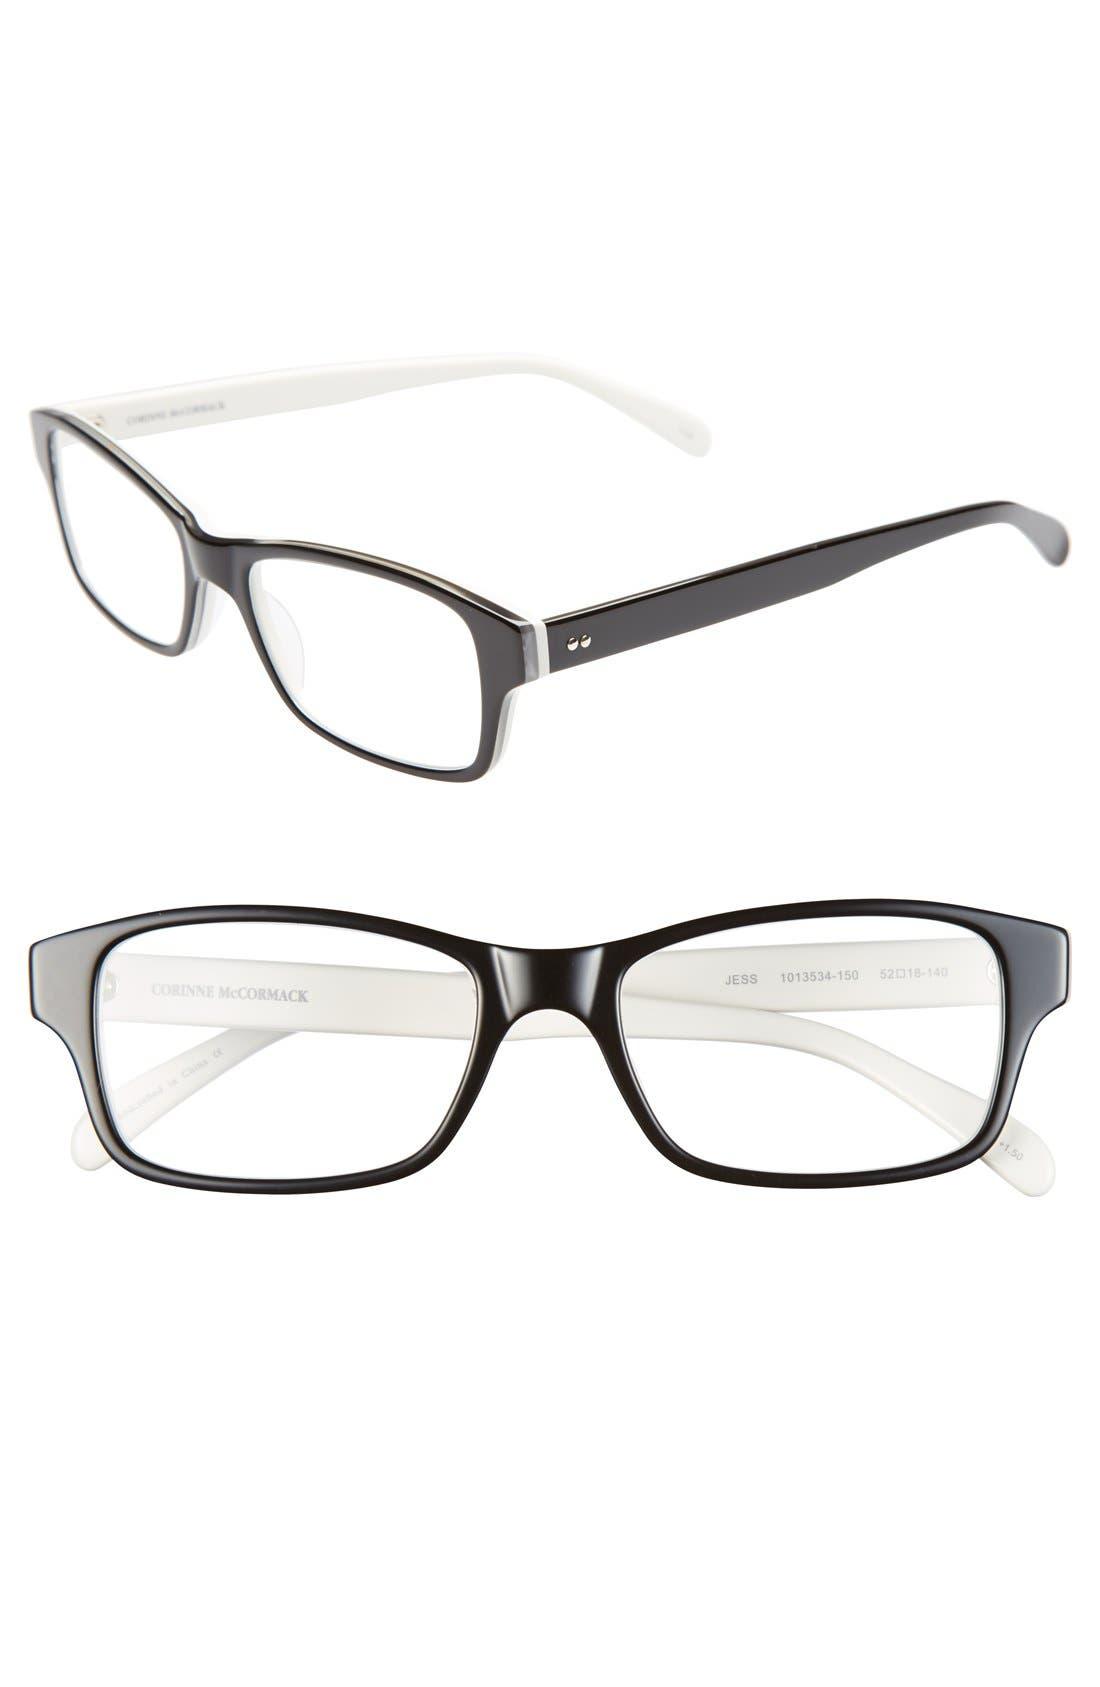 'Jess' 52mm Reading Glasses,                         Main,                         color, Black/ White